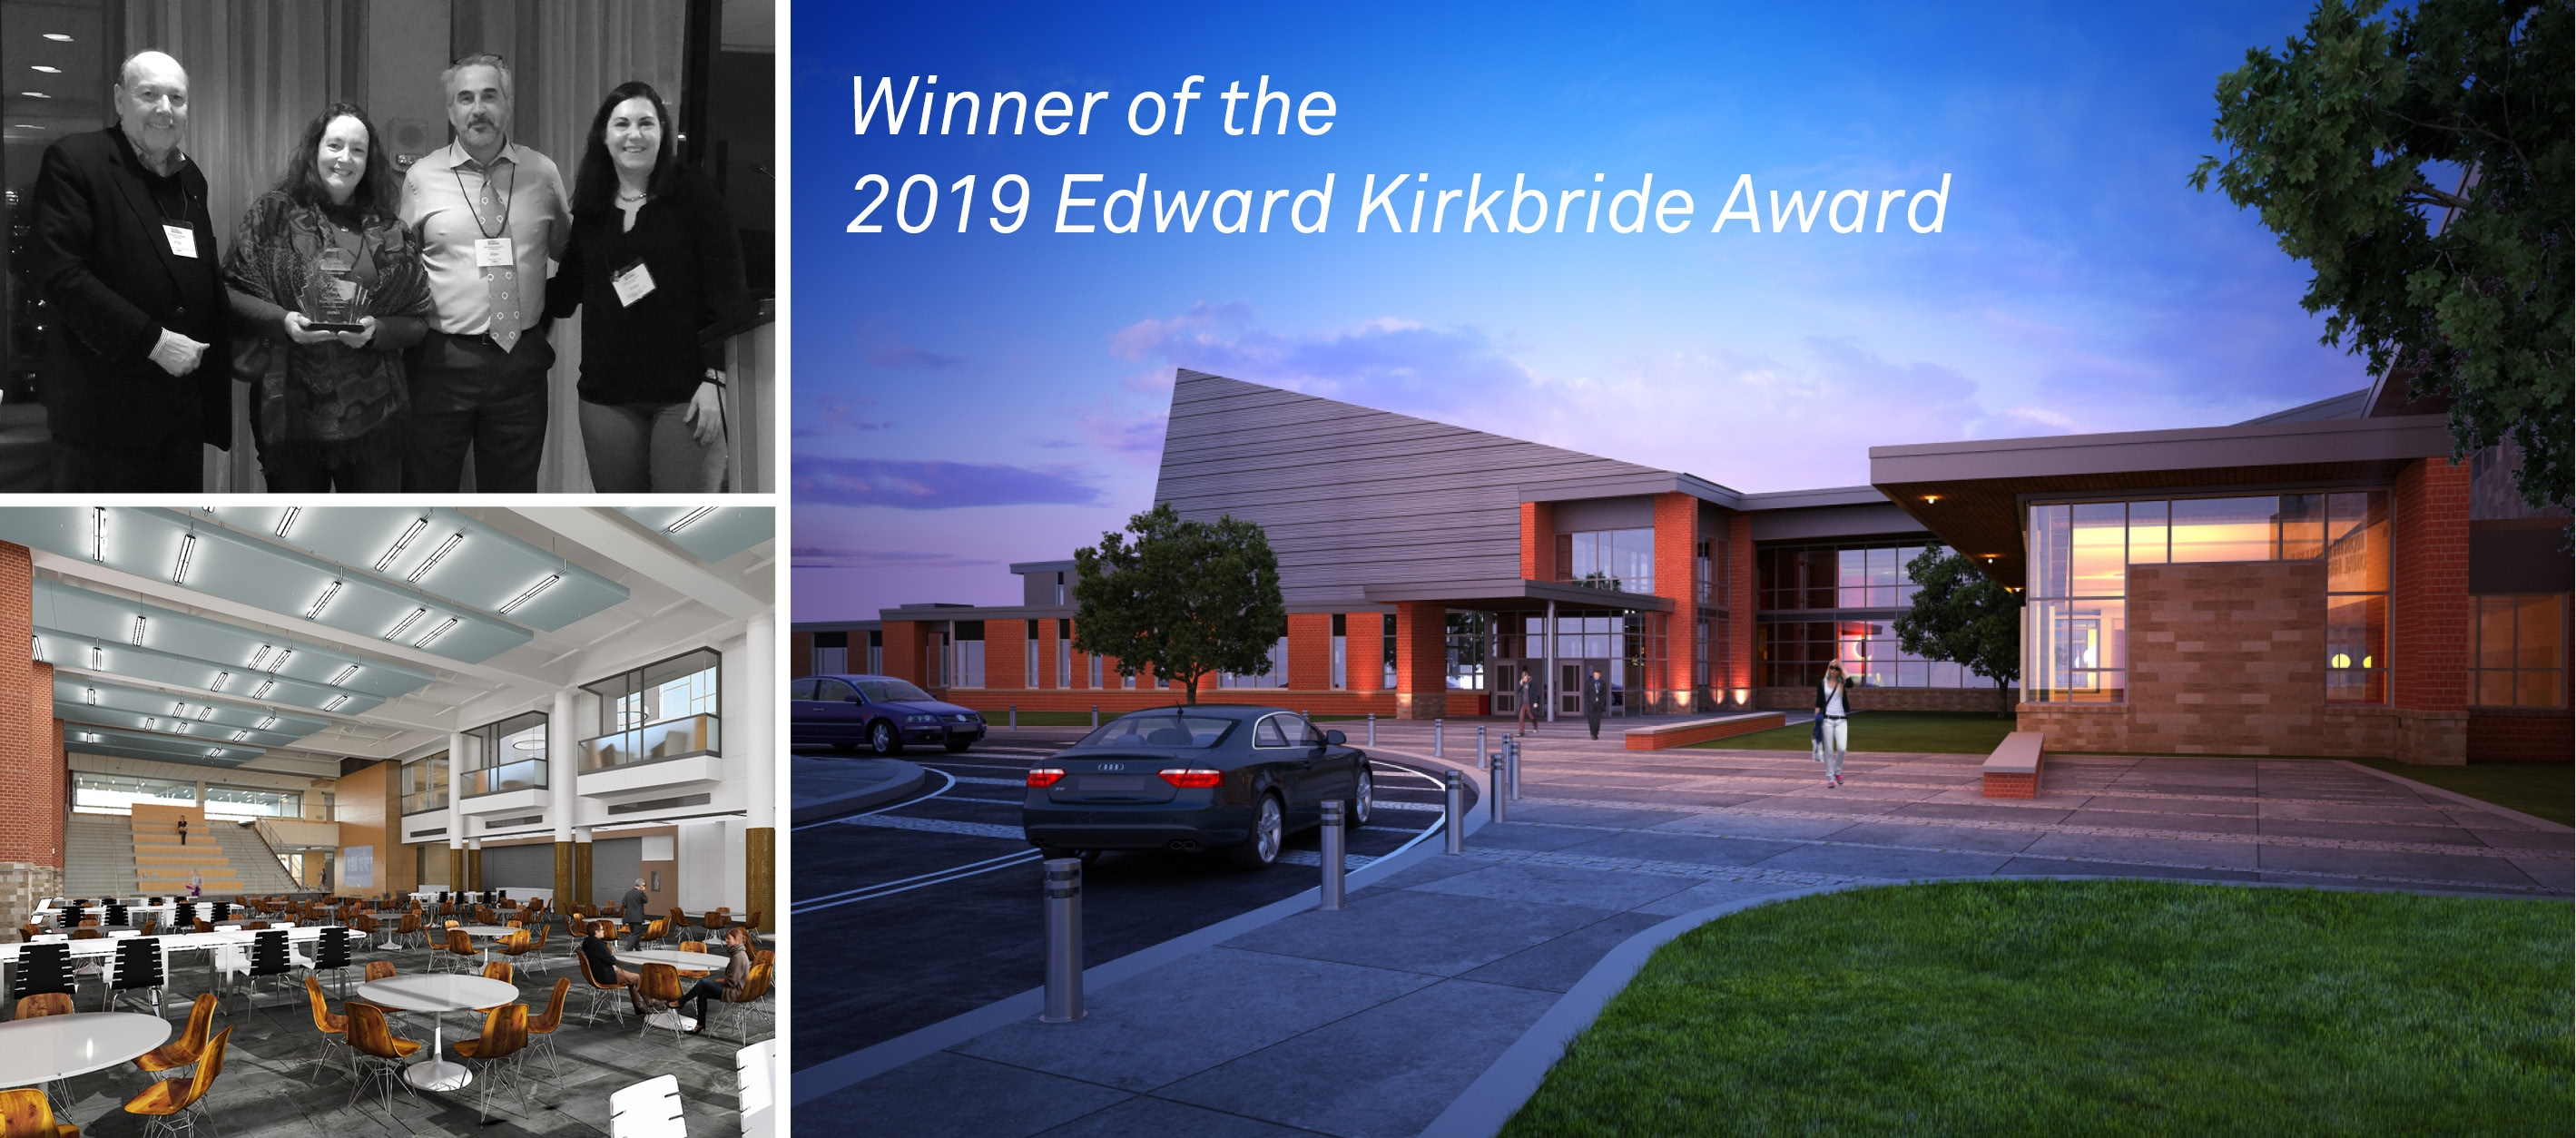 North Middlesex Regional High School Wins Edward Kirkbride Award